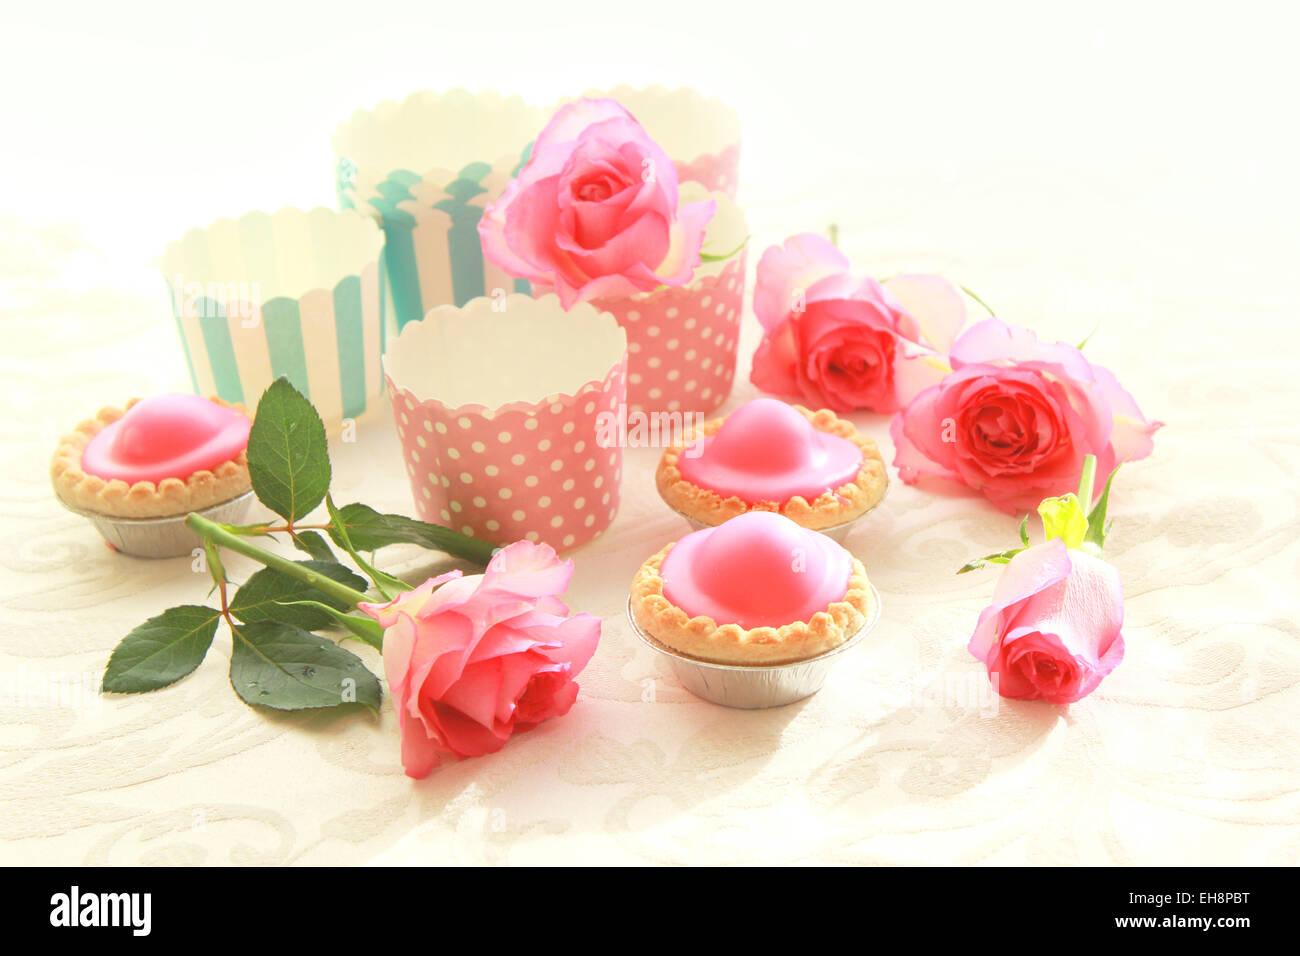 Rosa pasteles sobre placa azul con rosas rosas Imagen De Stock